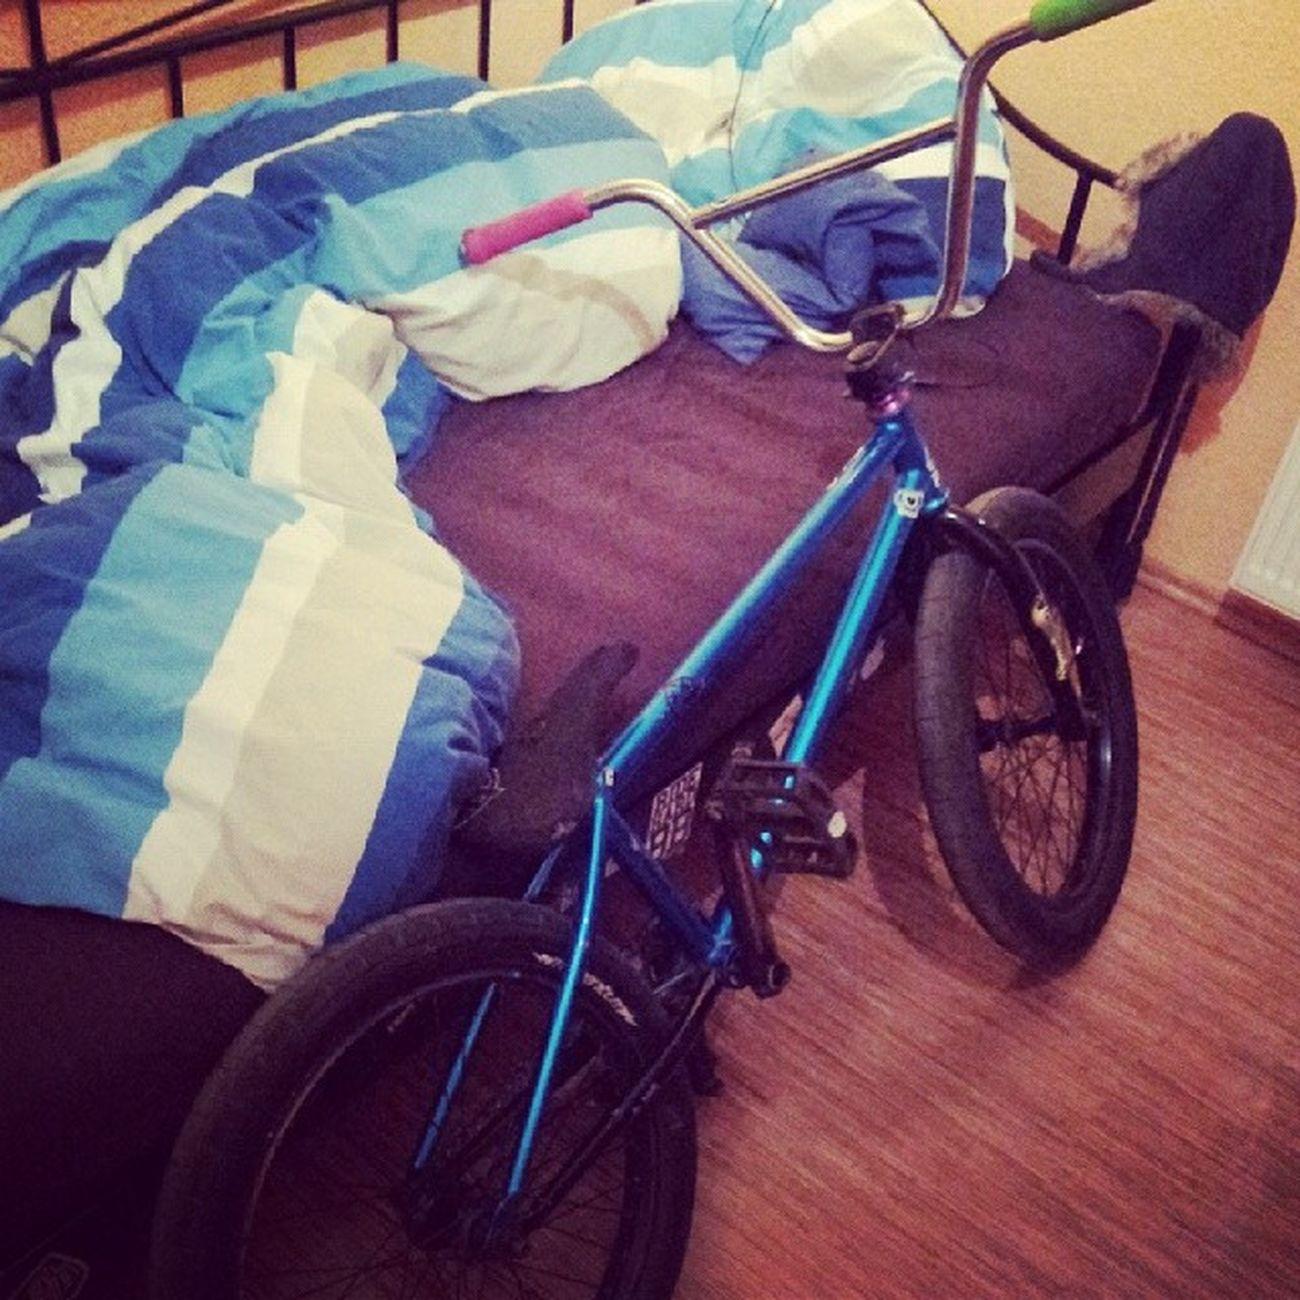 Morgen fette roll session zittau !! Bmx  Lhd Chill Proper bikeswtpbedgoodnight